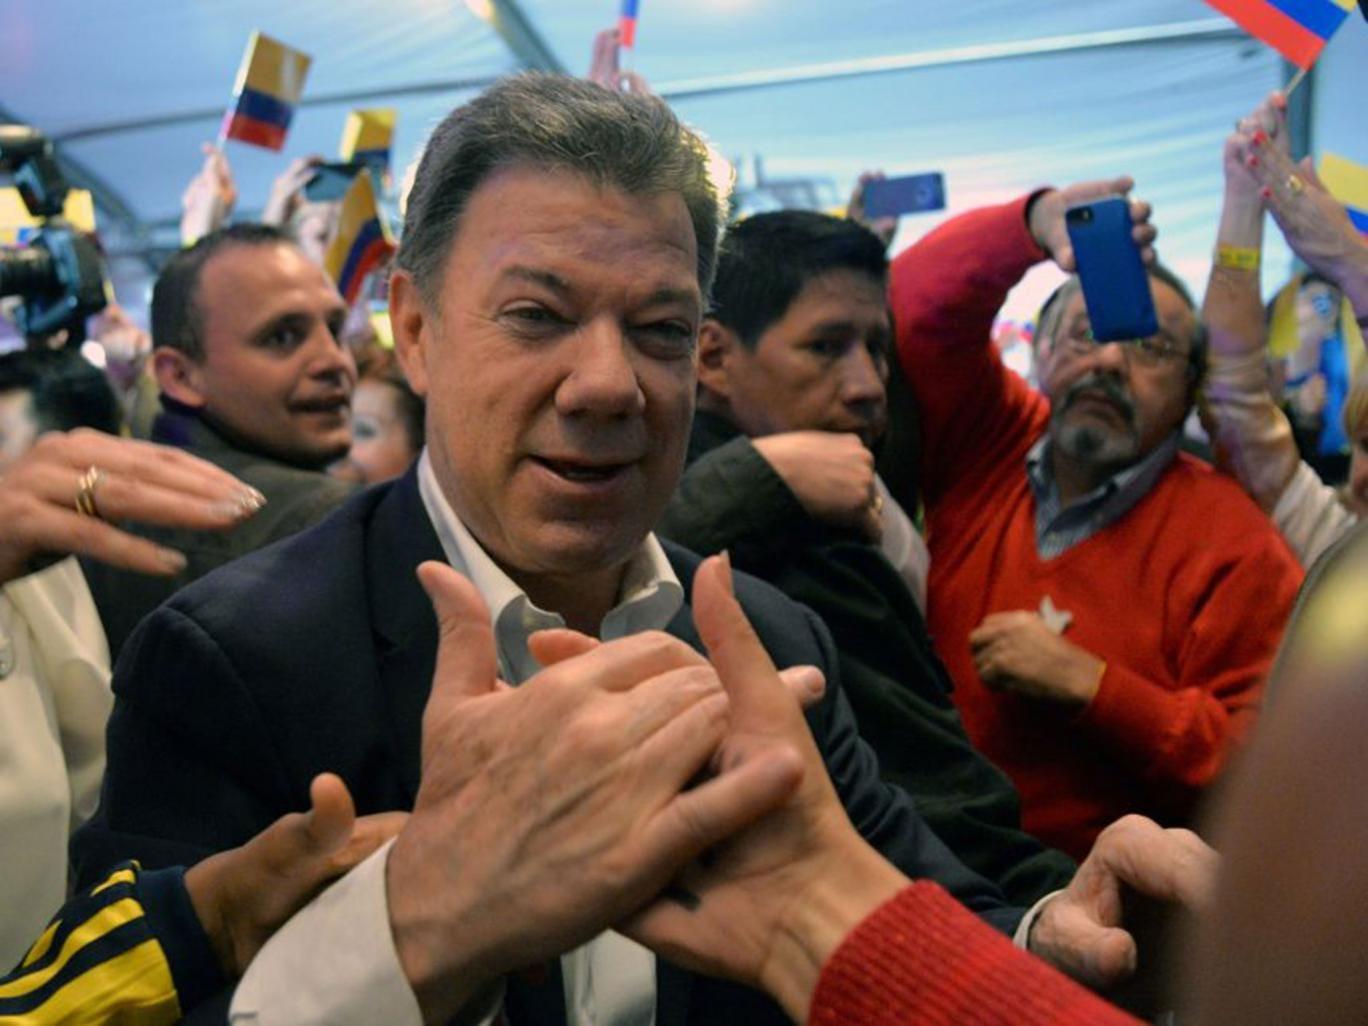 Juan Manuel Santos won nearly 51 per cent of the vote